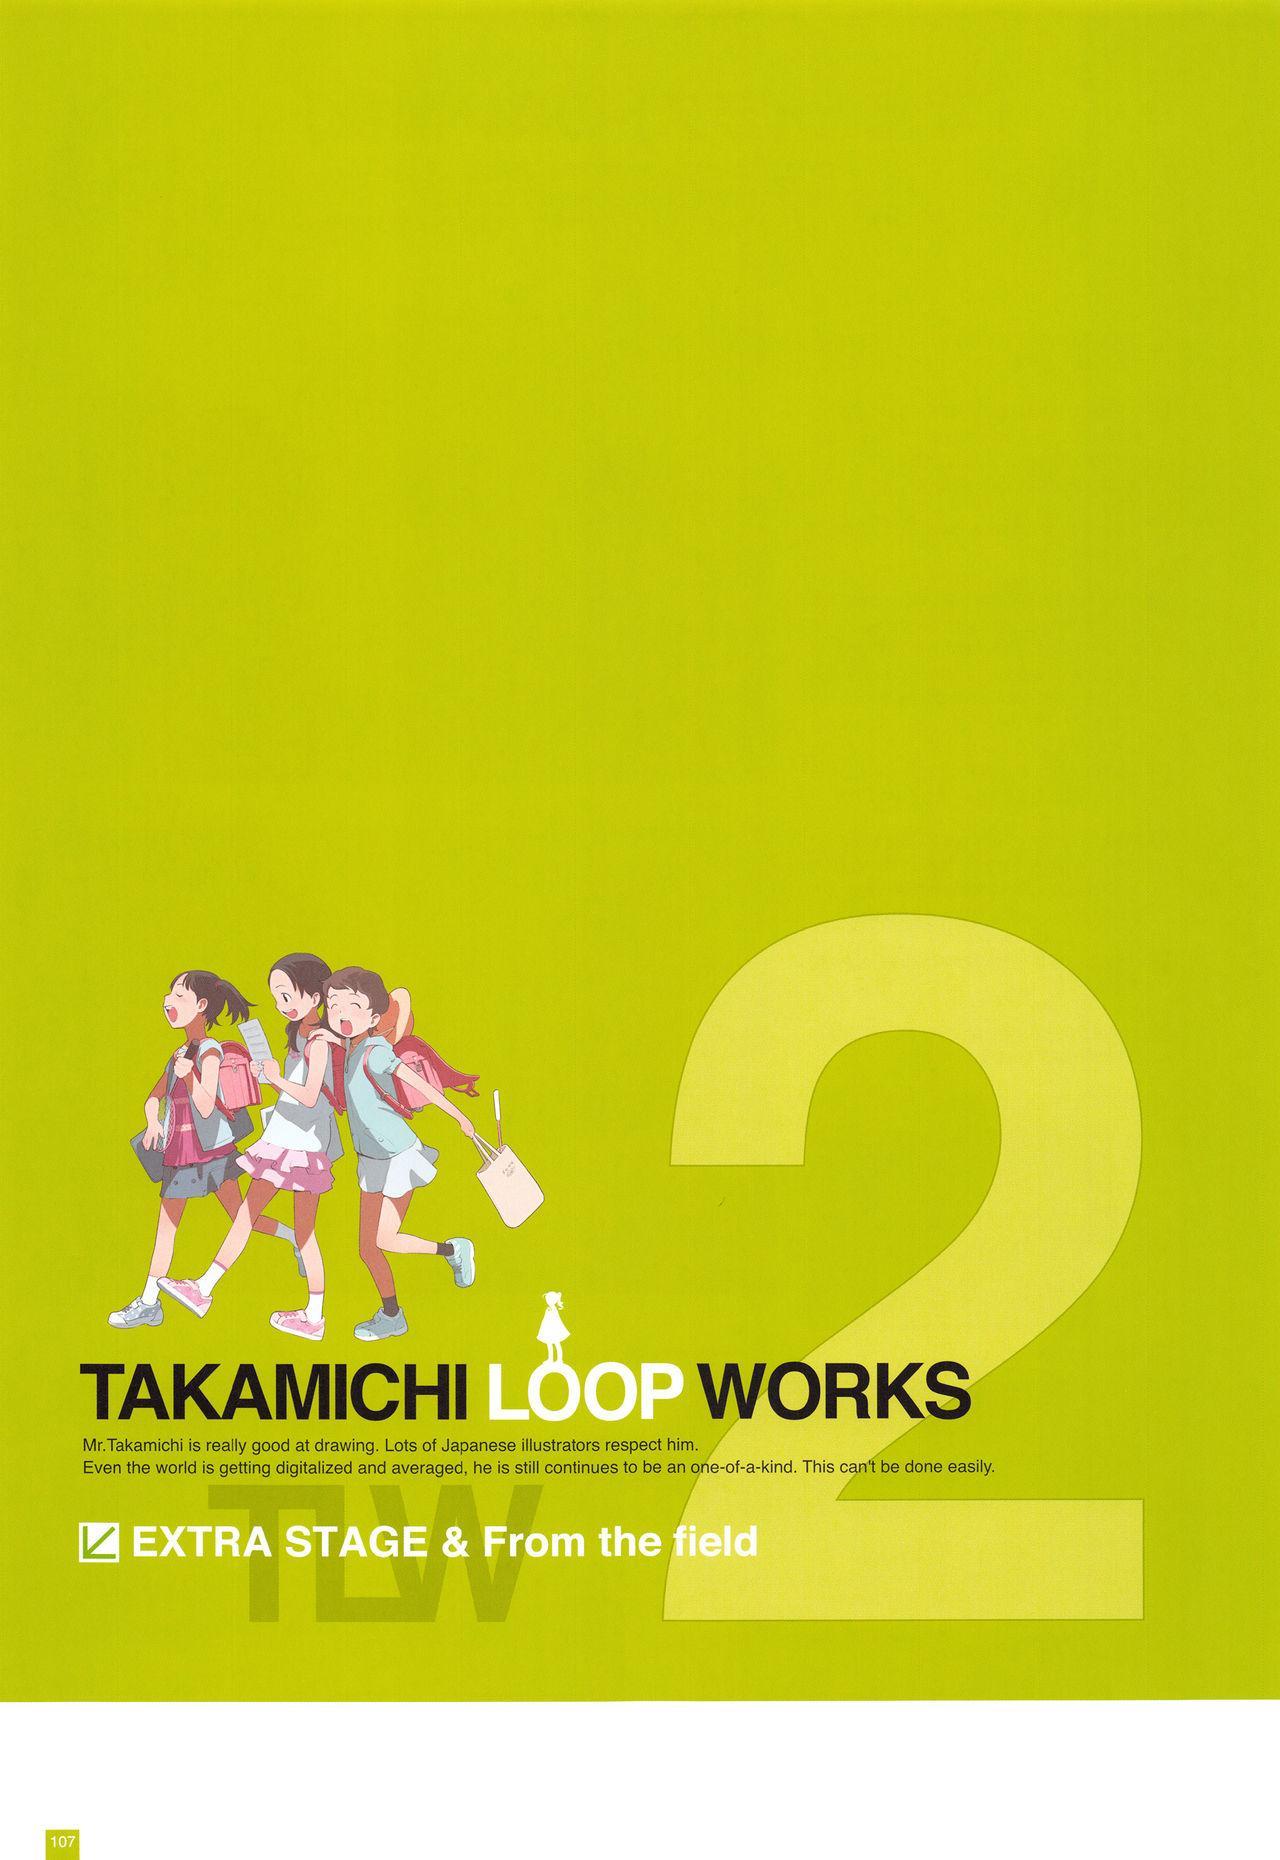 LO Artbook 2-A TAKAMICHI LOOP WORKS 109